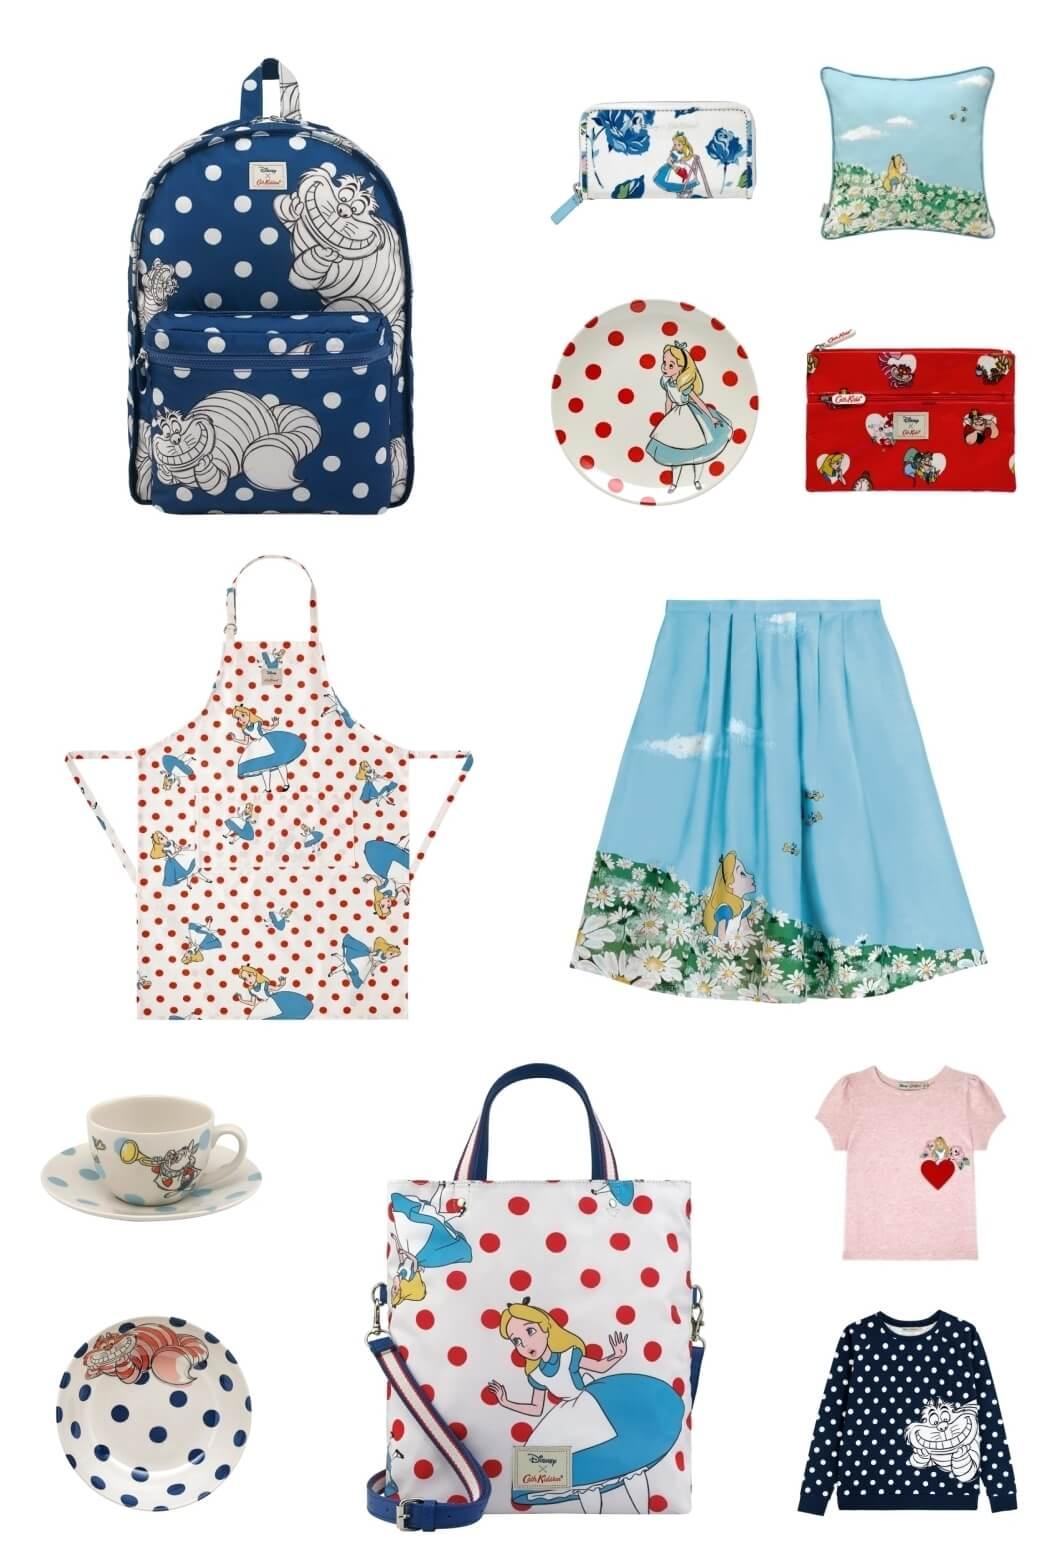 Alice In Wonderland Disney x Cath Kidston